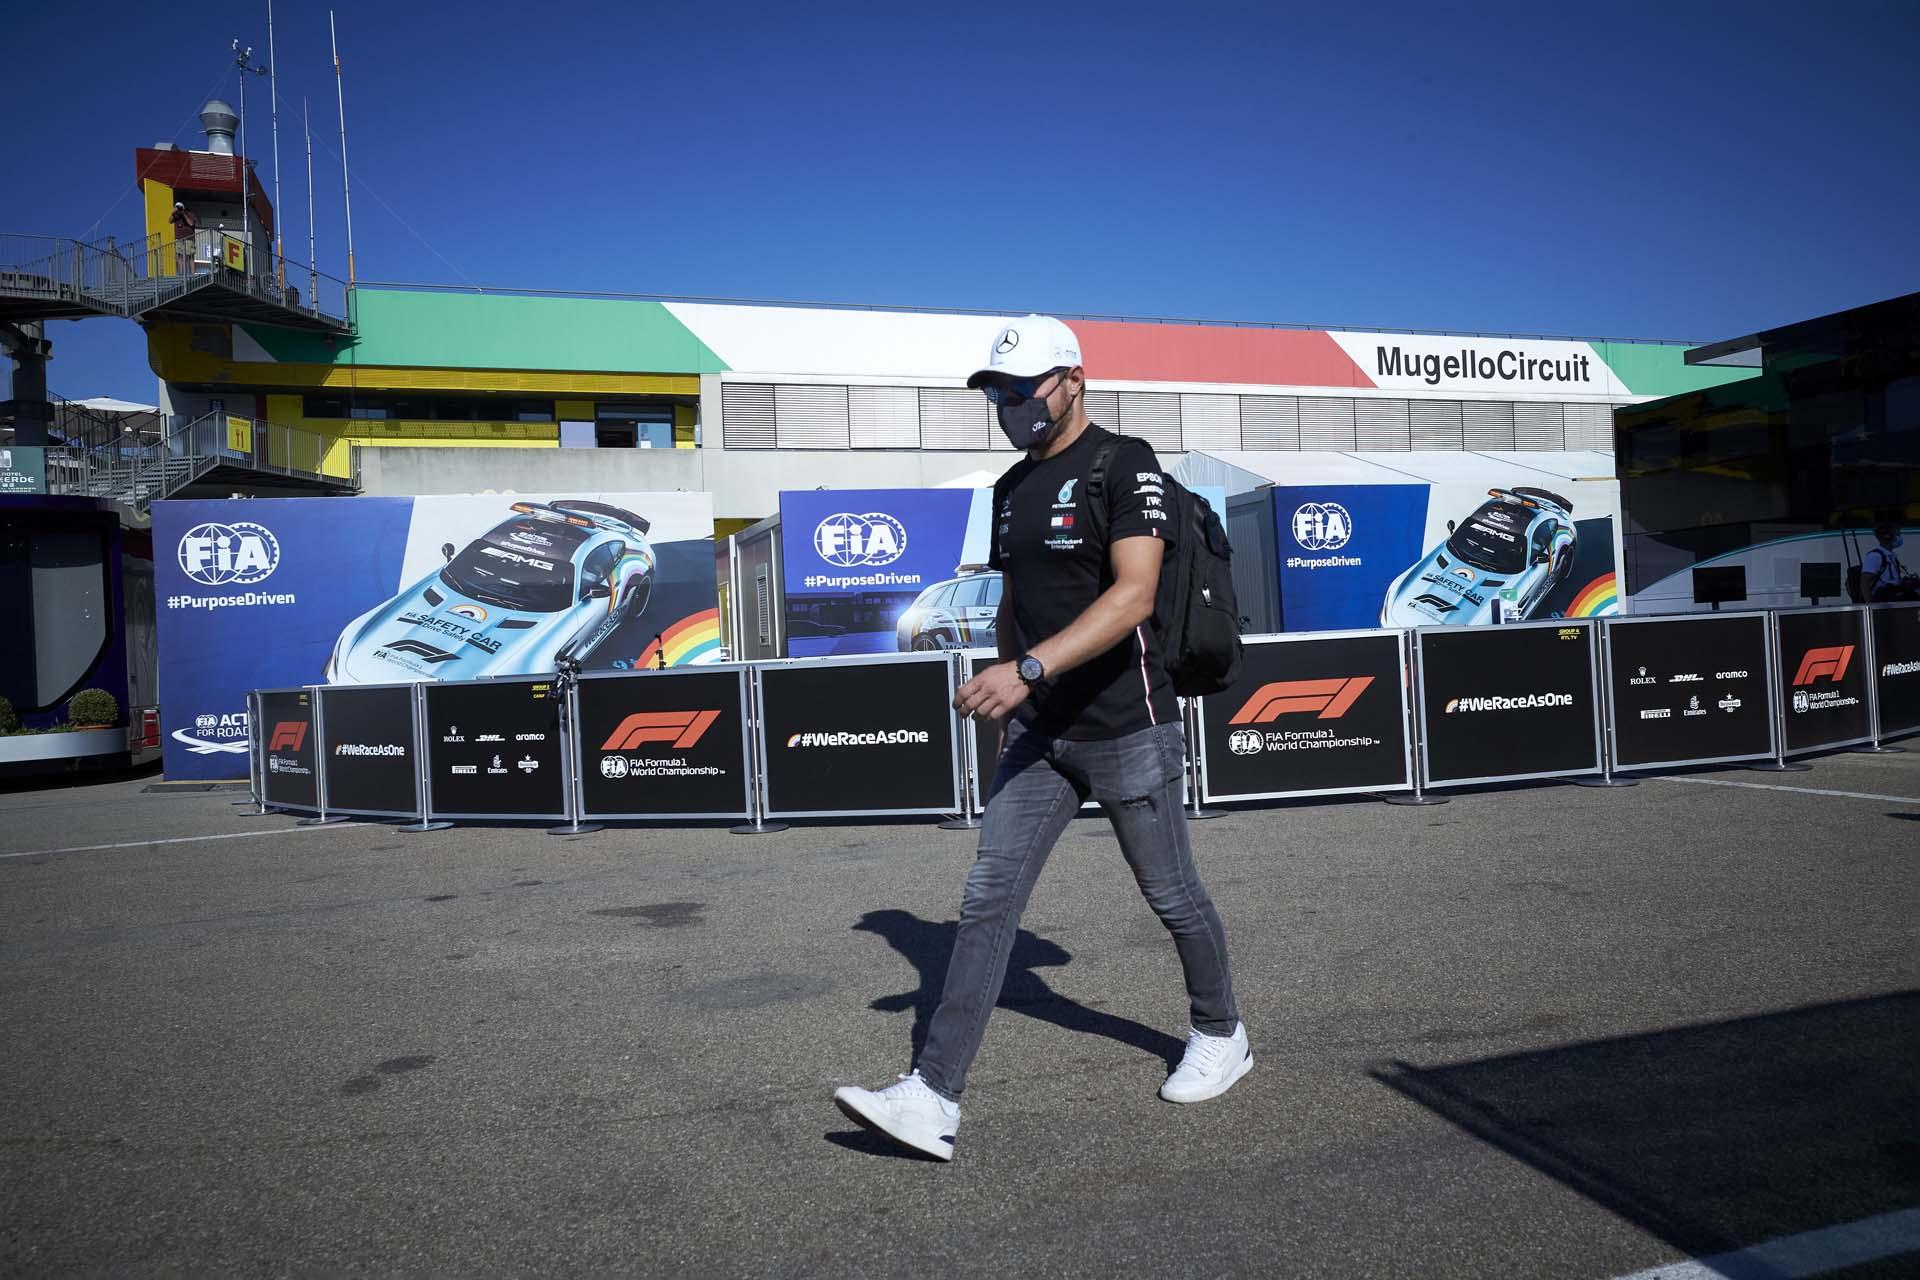 2020 Tuscan Grand Prix, Saturday - Steve Etherington